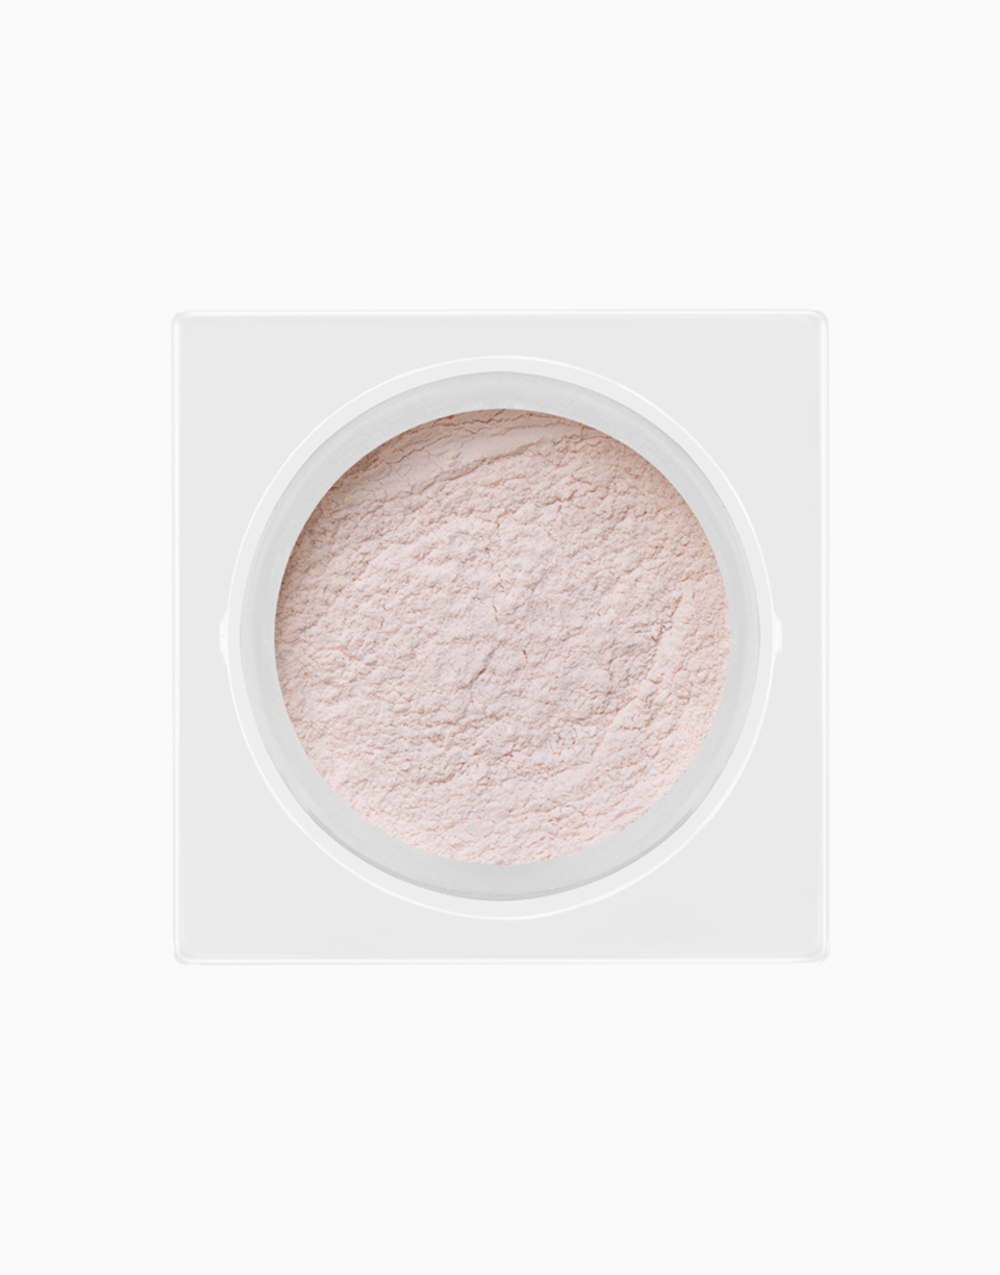 Baking Powder by KKW Beauty   #2 Translucent Pastel Pink